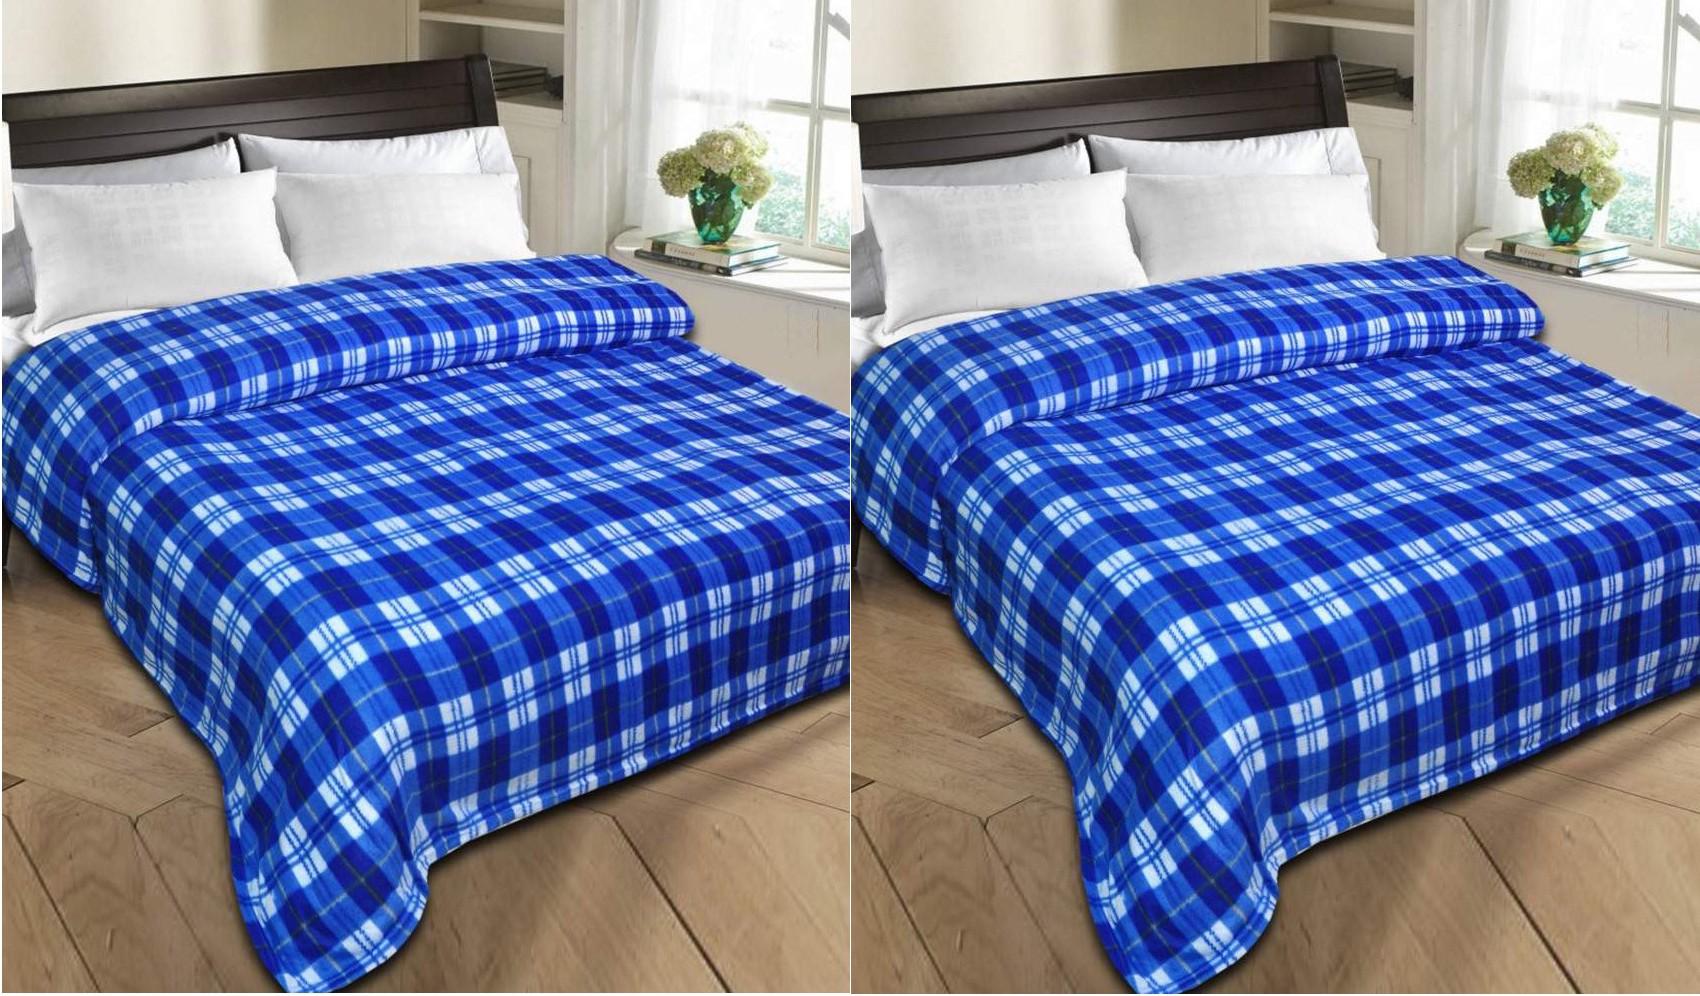 Styletex Checkered Single Blanket Blue(Fleece Blanket, 2 Blue Blankets)